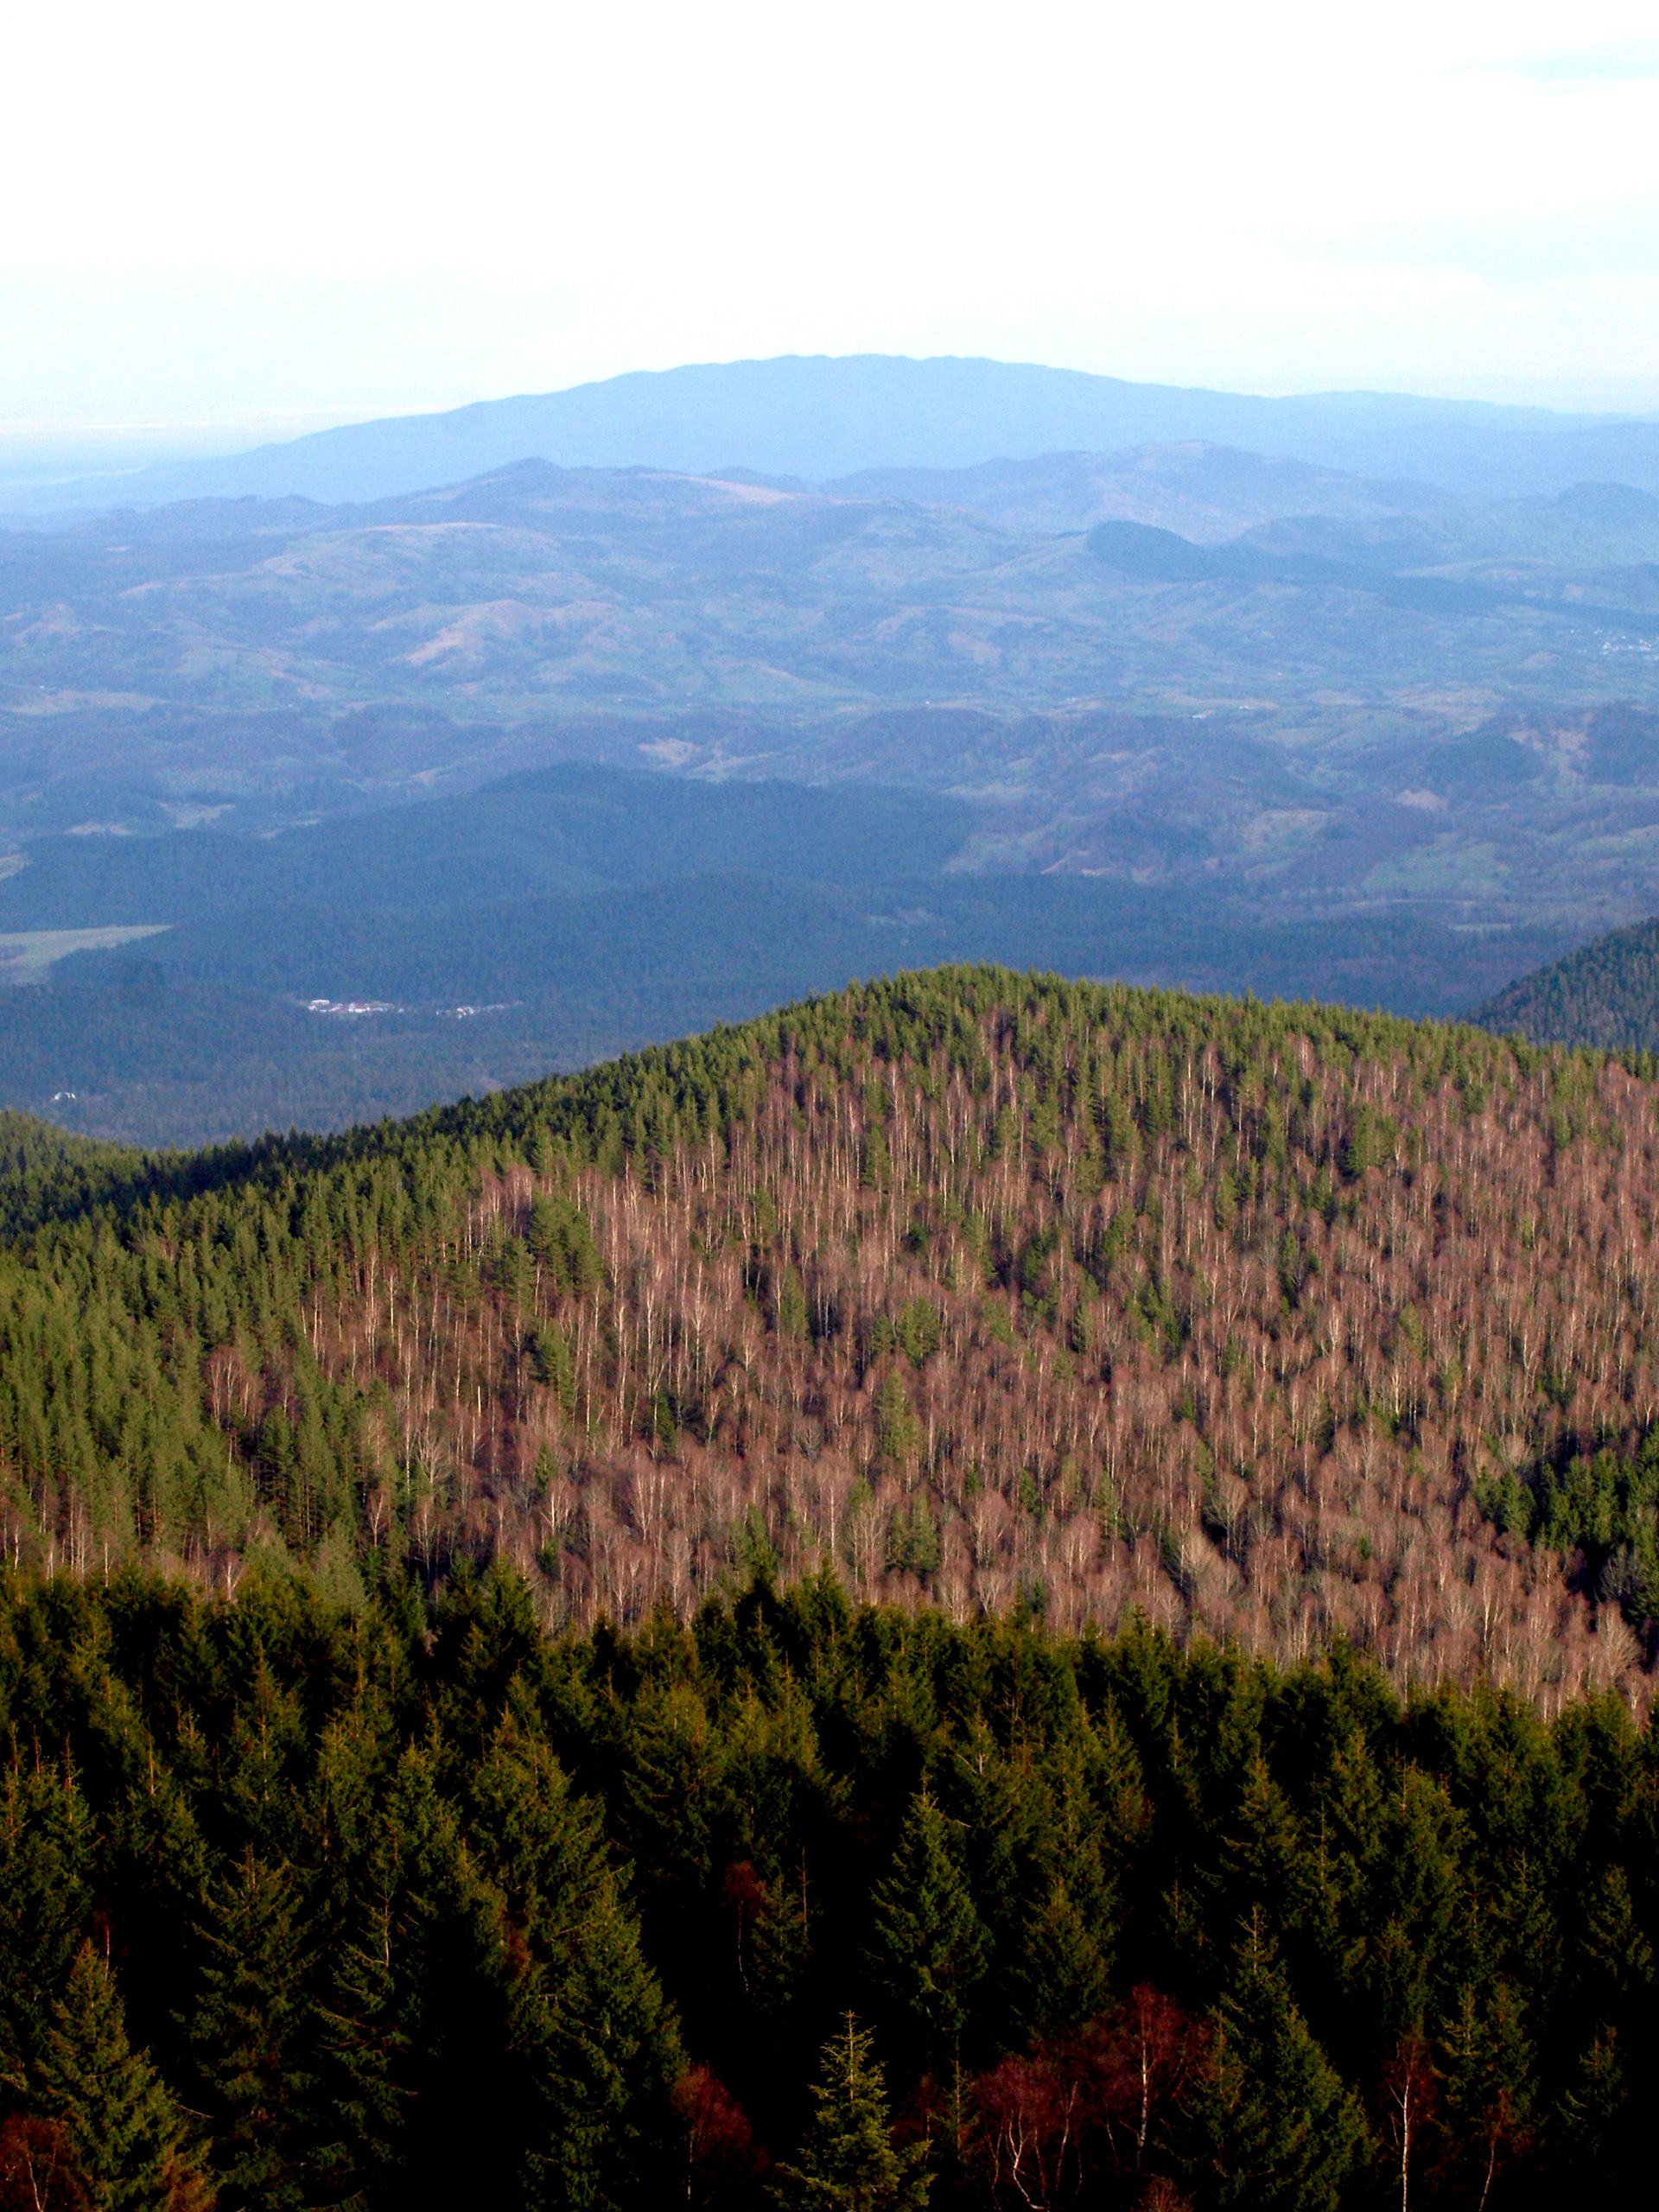 Munții Vrancei, Magura-Odobesti